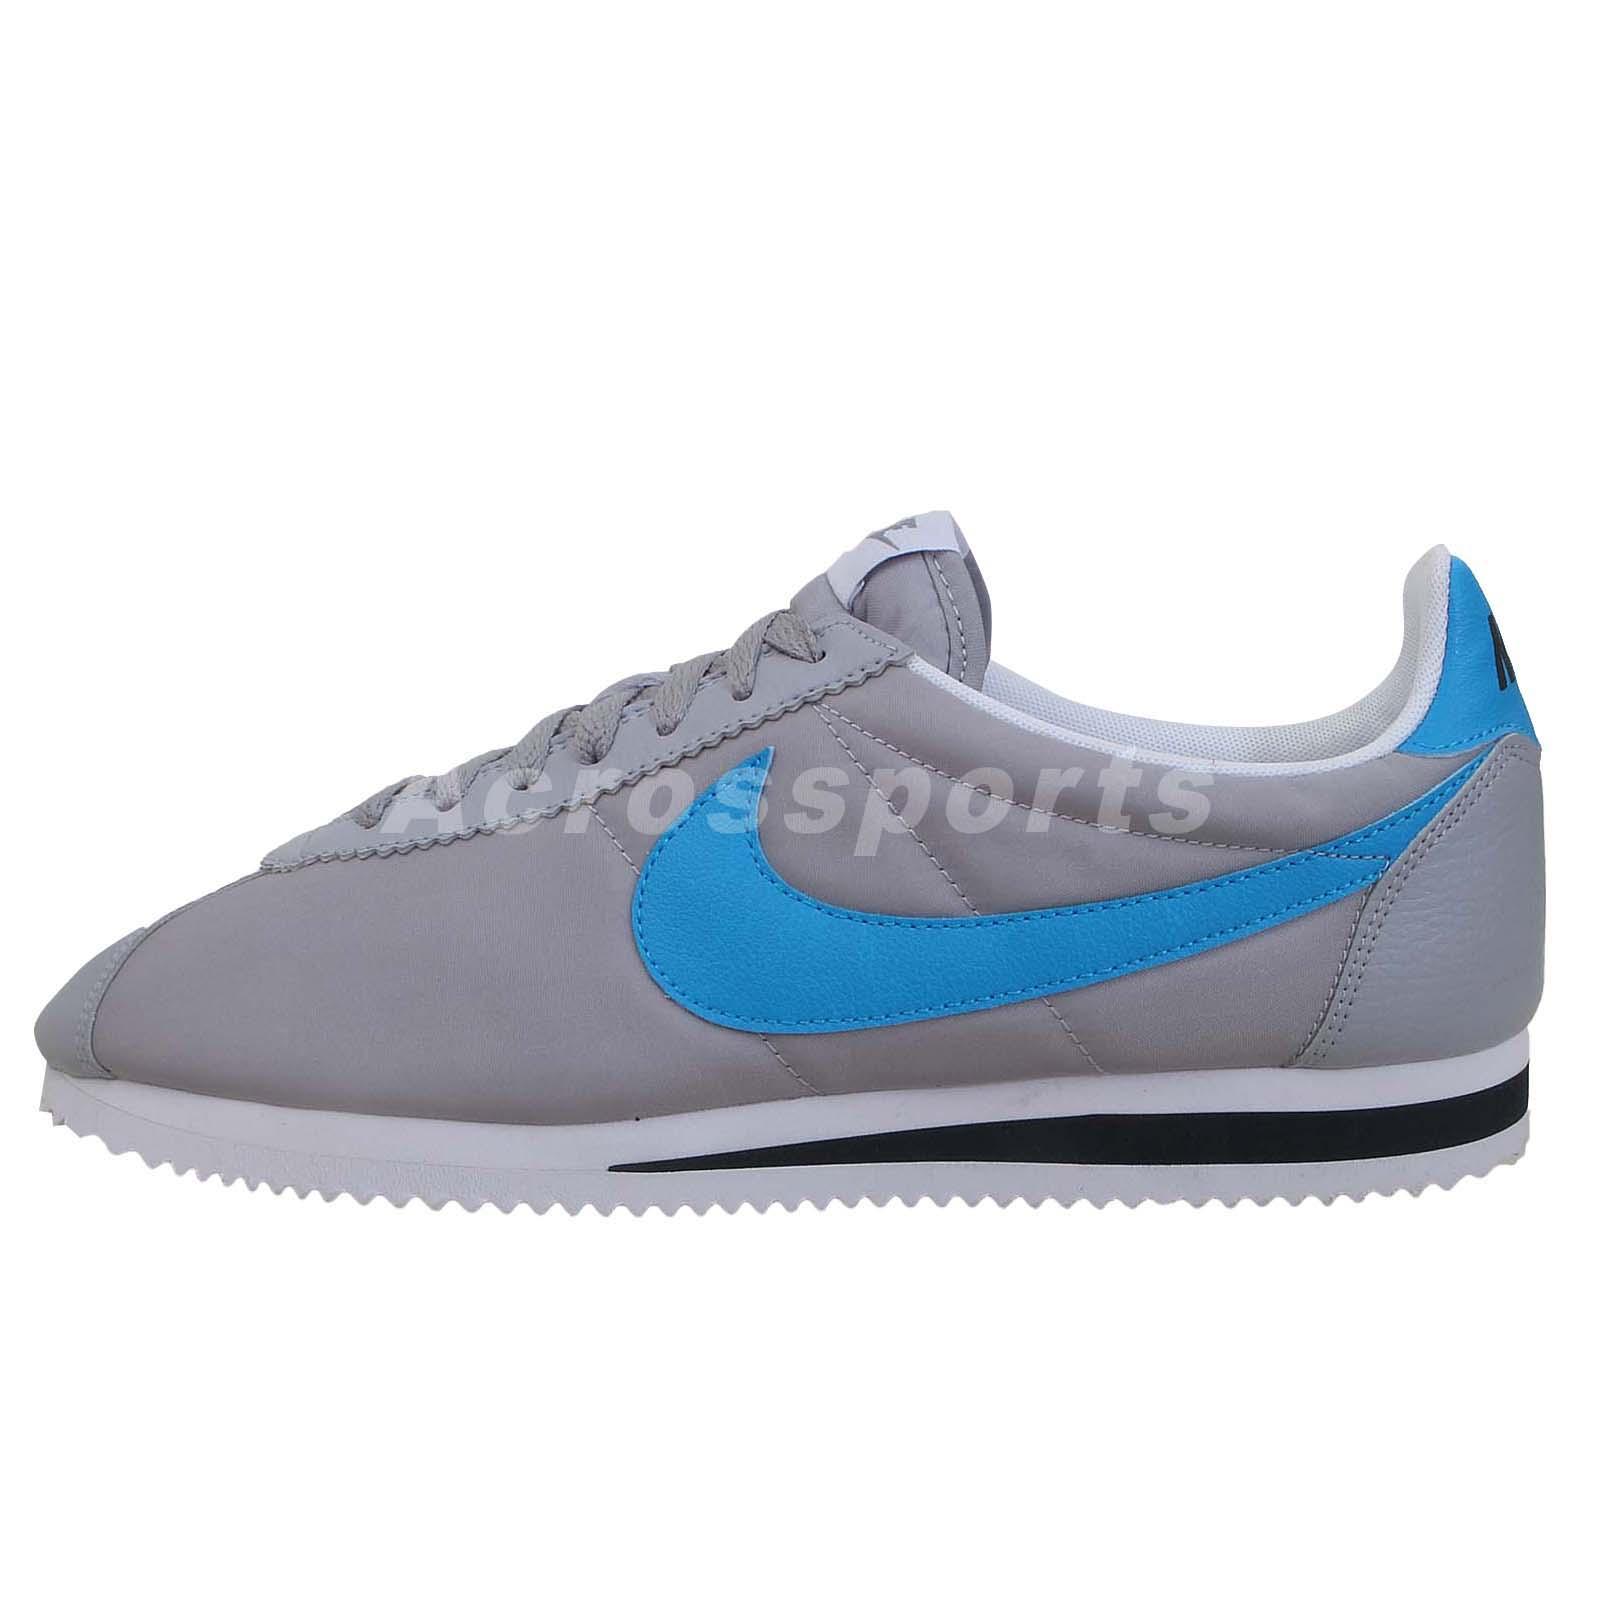 nike classic cortez grey blue 2014 mens retro